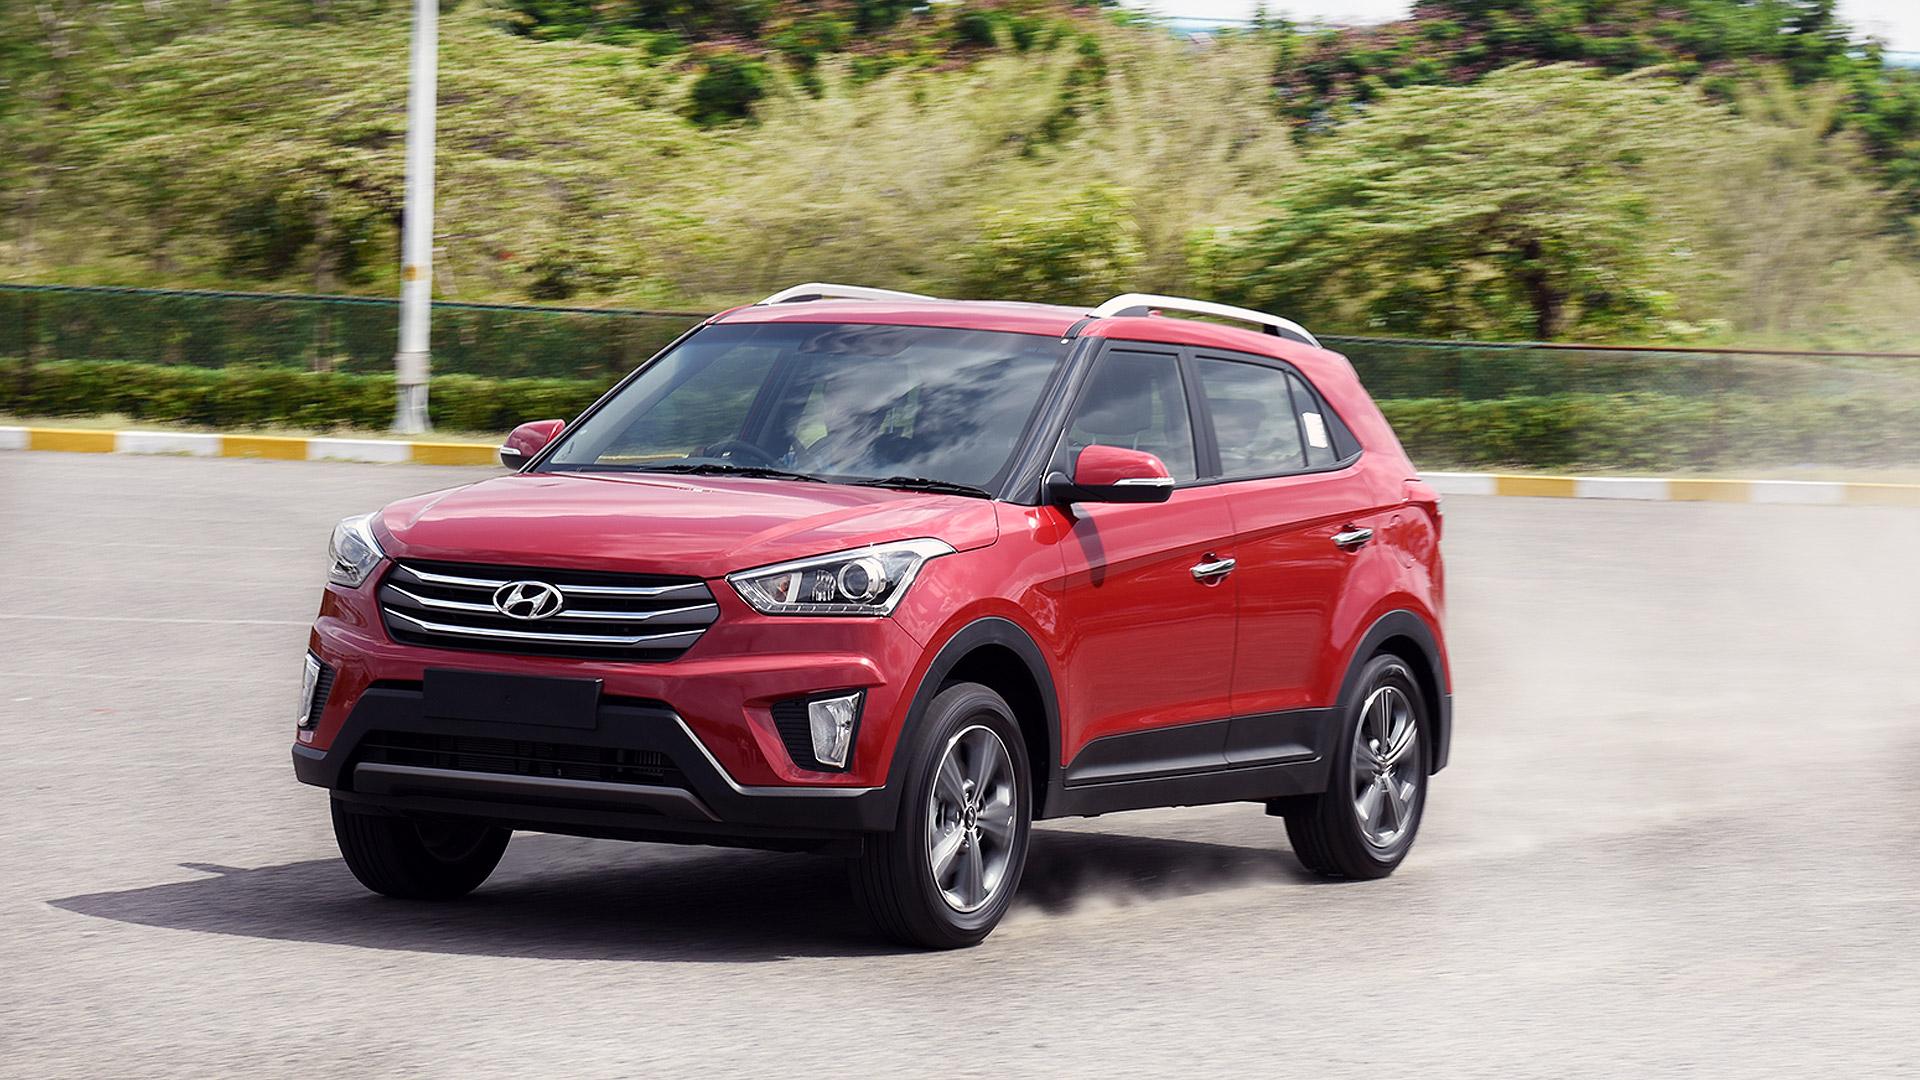 Hyundai Creta 2015 1 6 Sx Plus Diesel Price Mileage Reviews